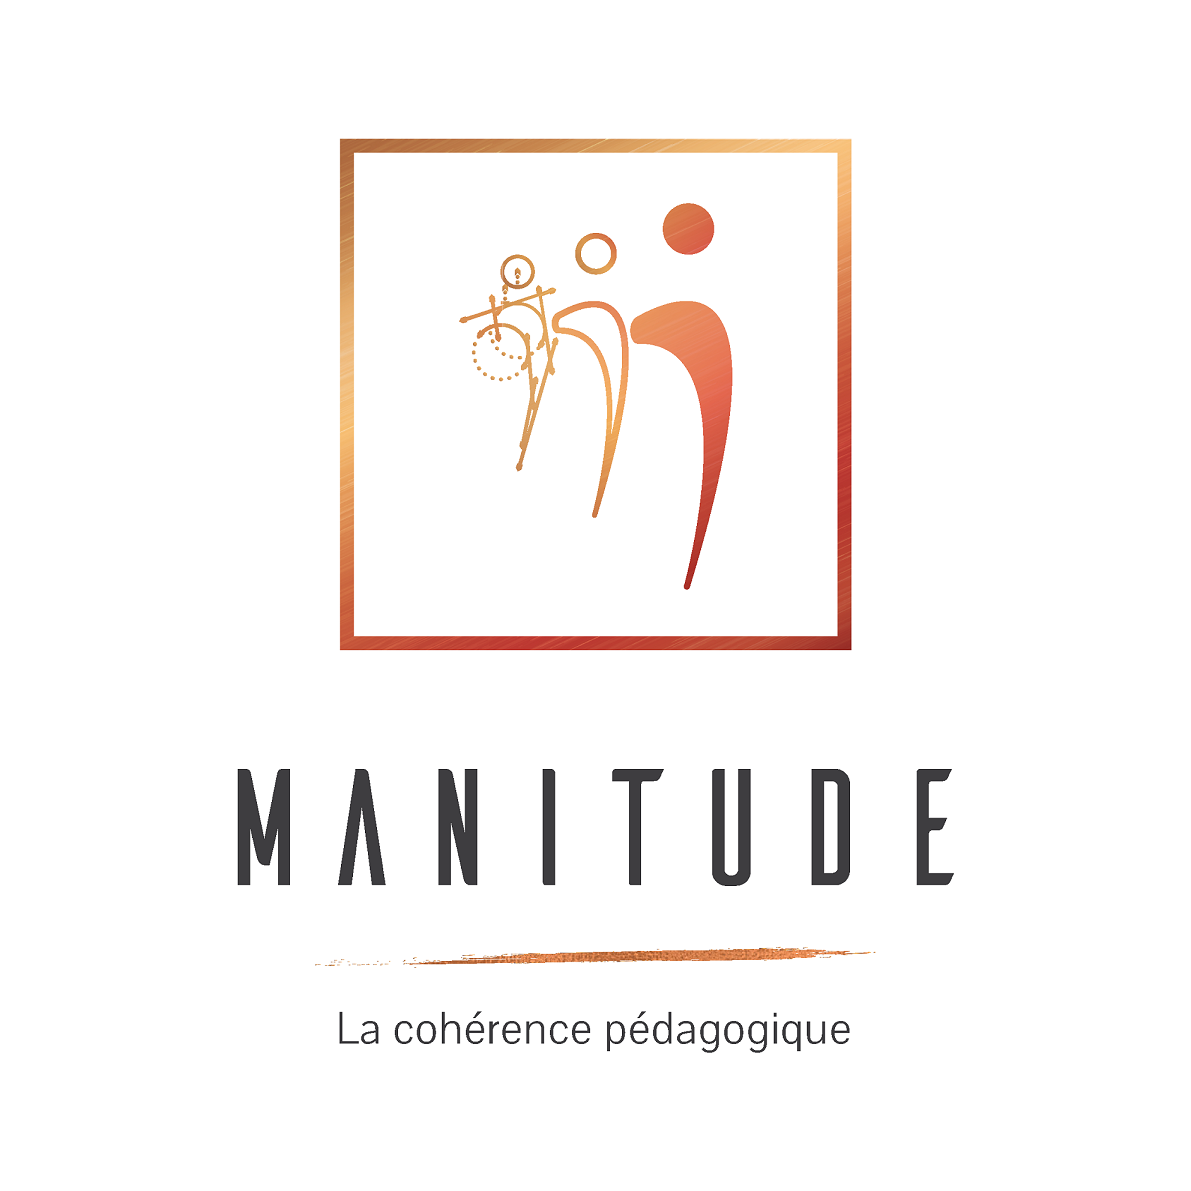 Manitude